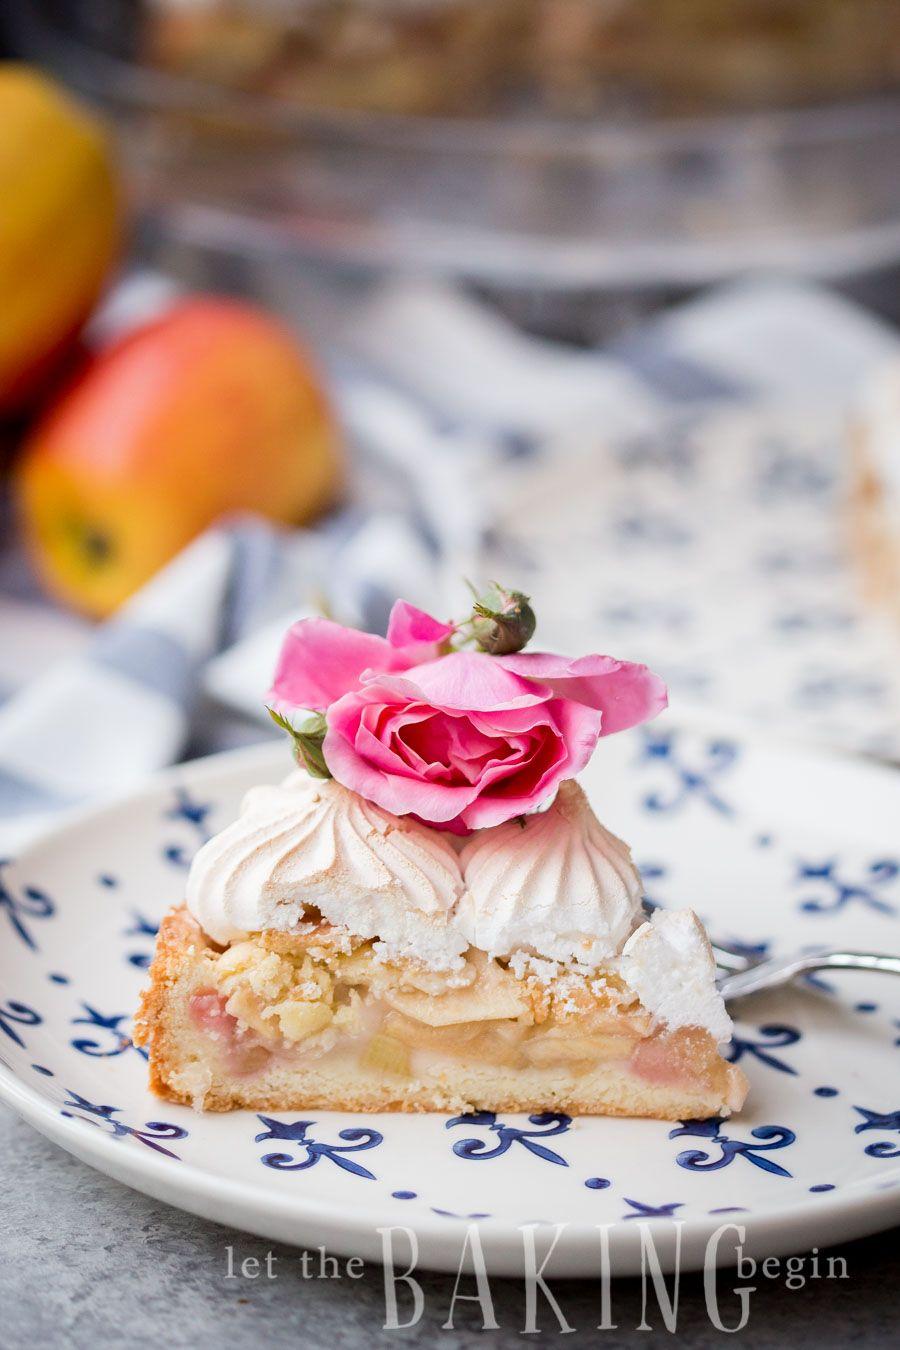 Apple Rhubarb Meringue Pirog (Russian Pie) - Let the Baking Begin! #napoleonkuchenrussisch